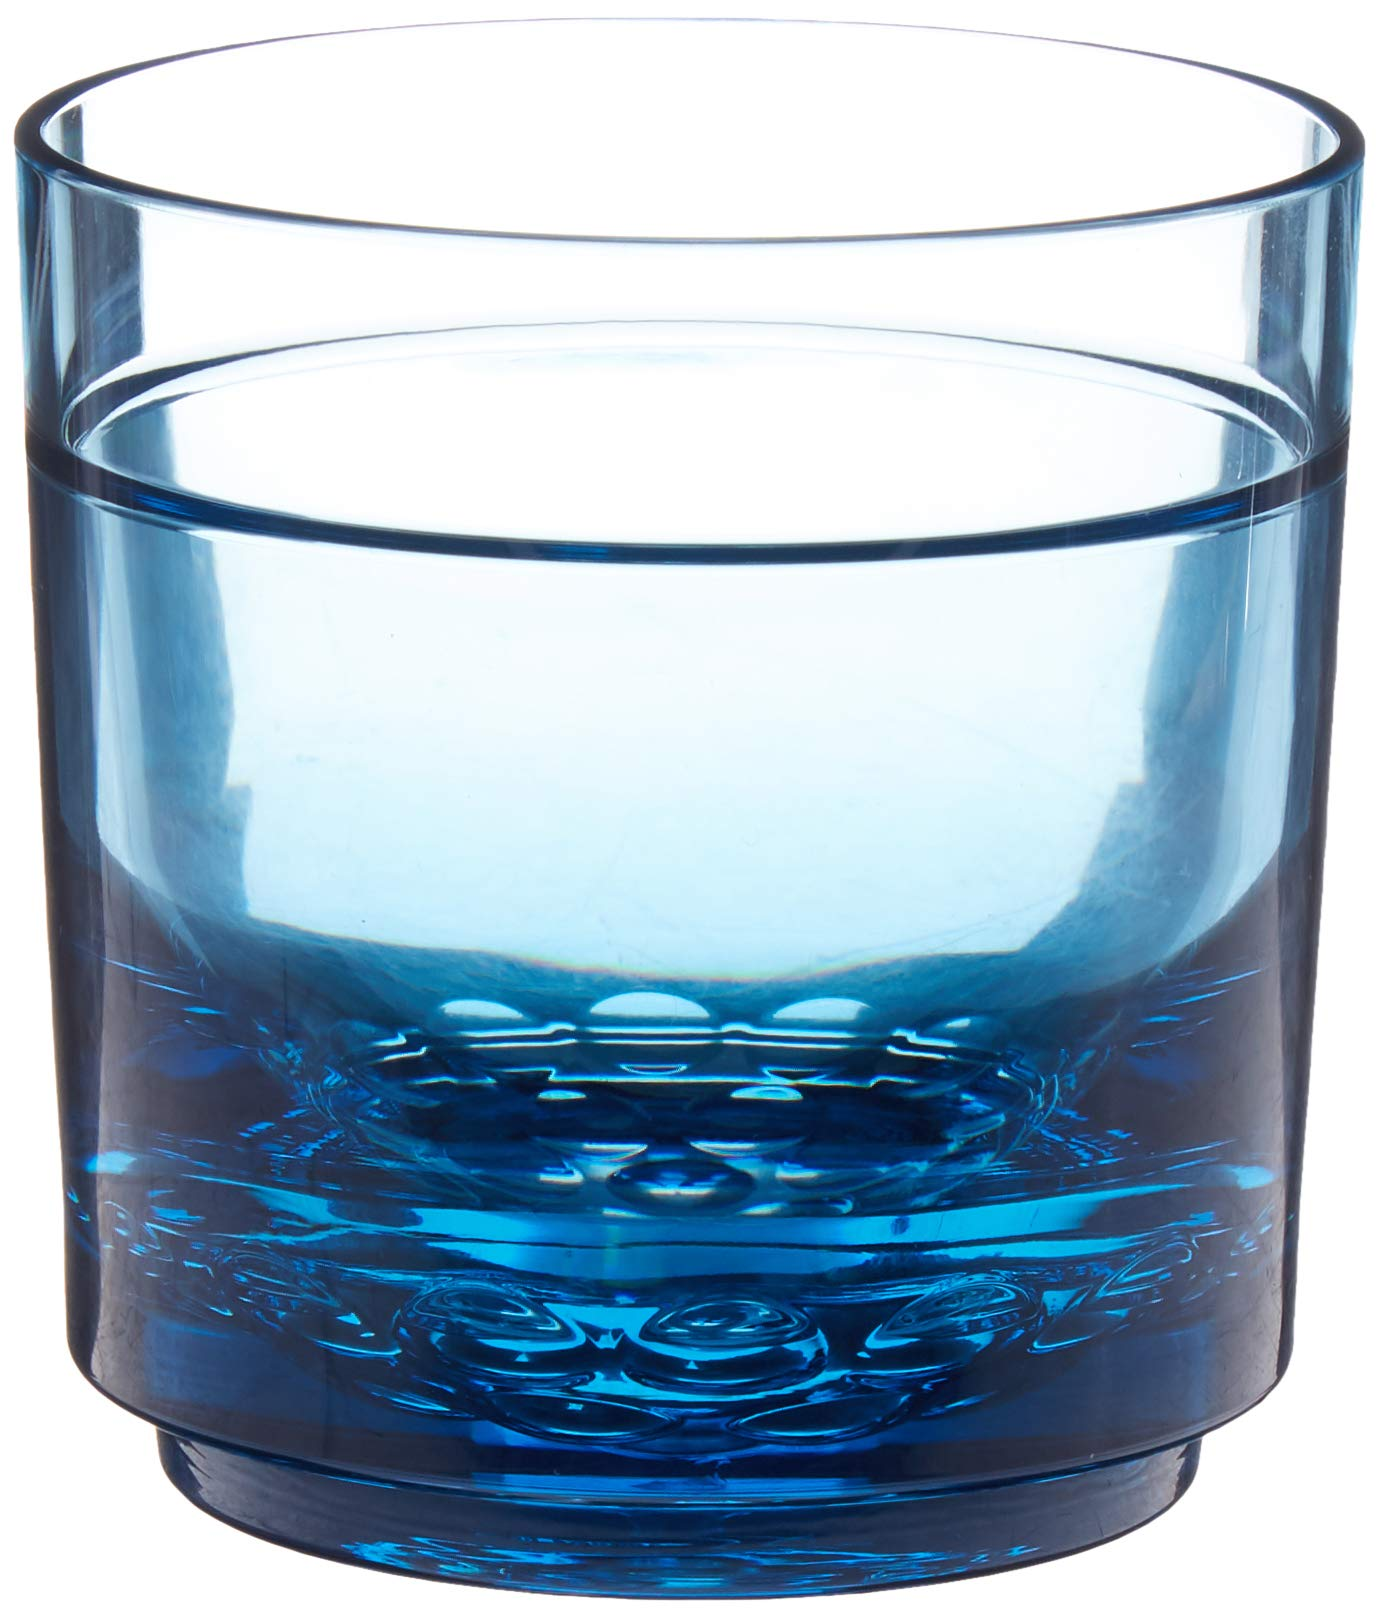 Drinique ELT-RK-BLU-24 Elite Rocks Unbreakable Tritan Whiskey Glasses, 10 oz (Case of 24), Blue